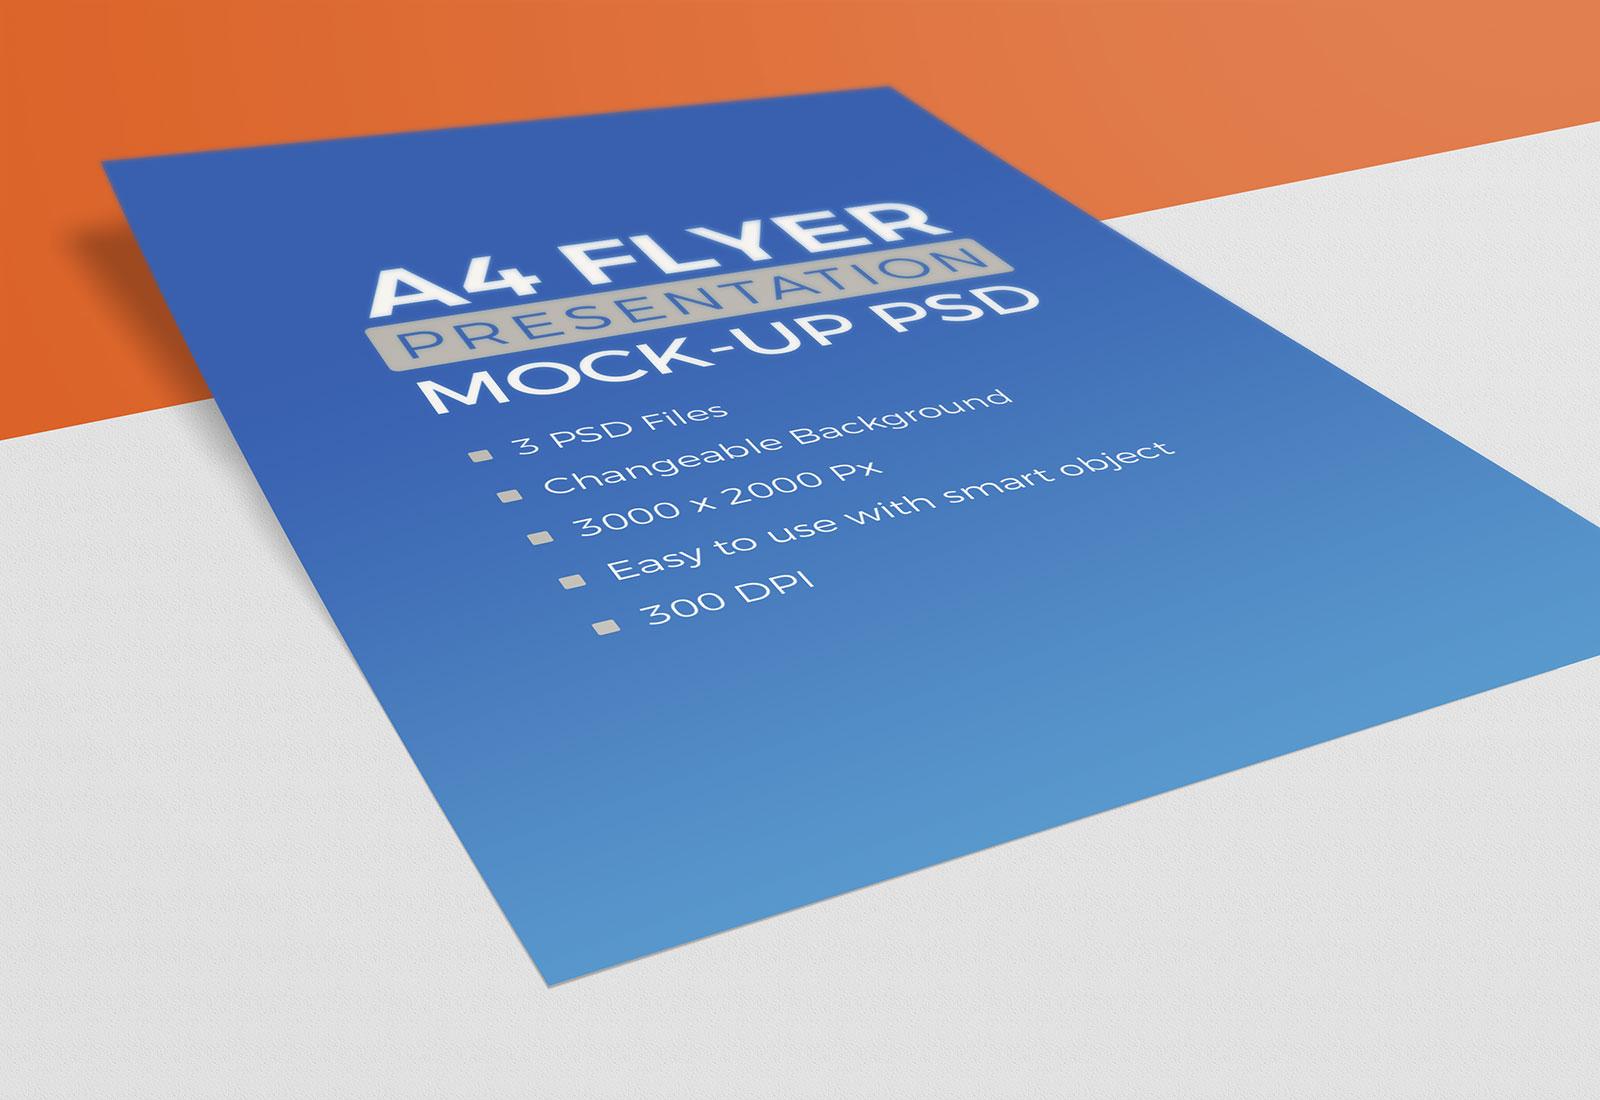 Free-A4-Resume-Letterhead-Flyer-Mockup-PSD-1